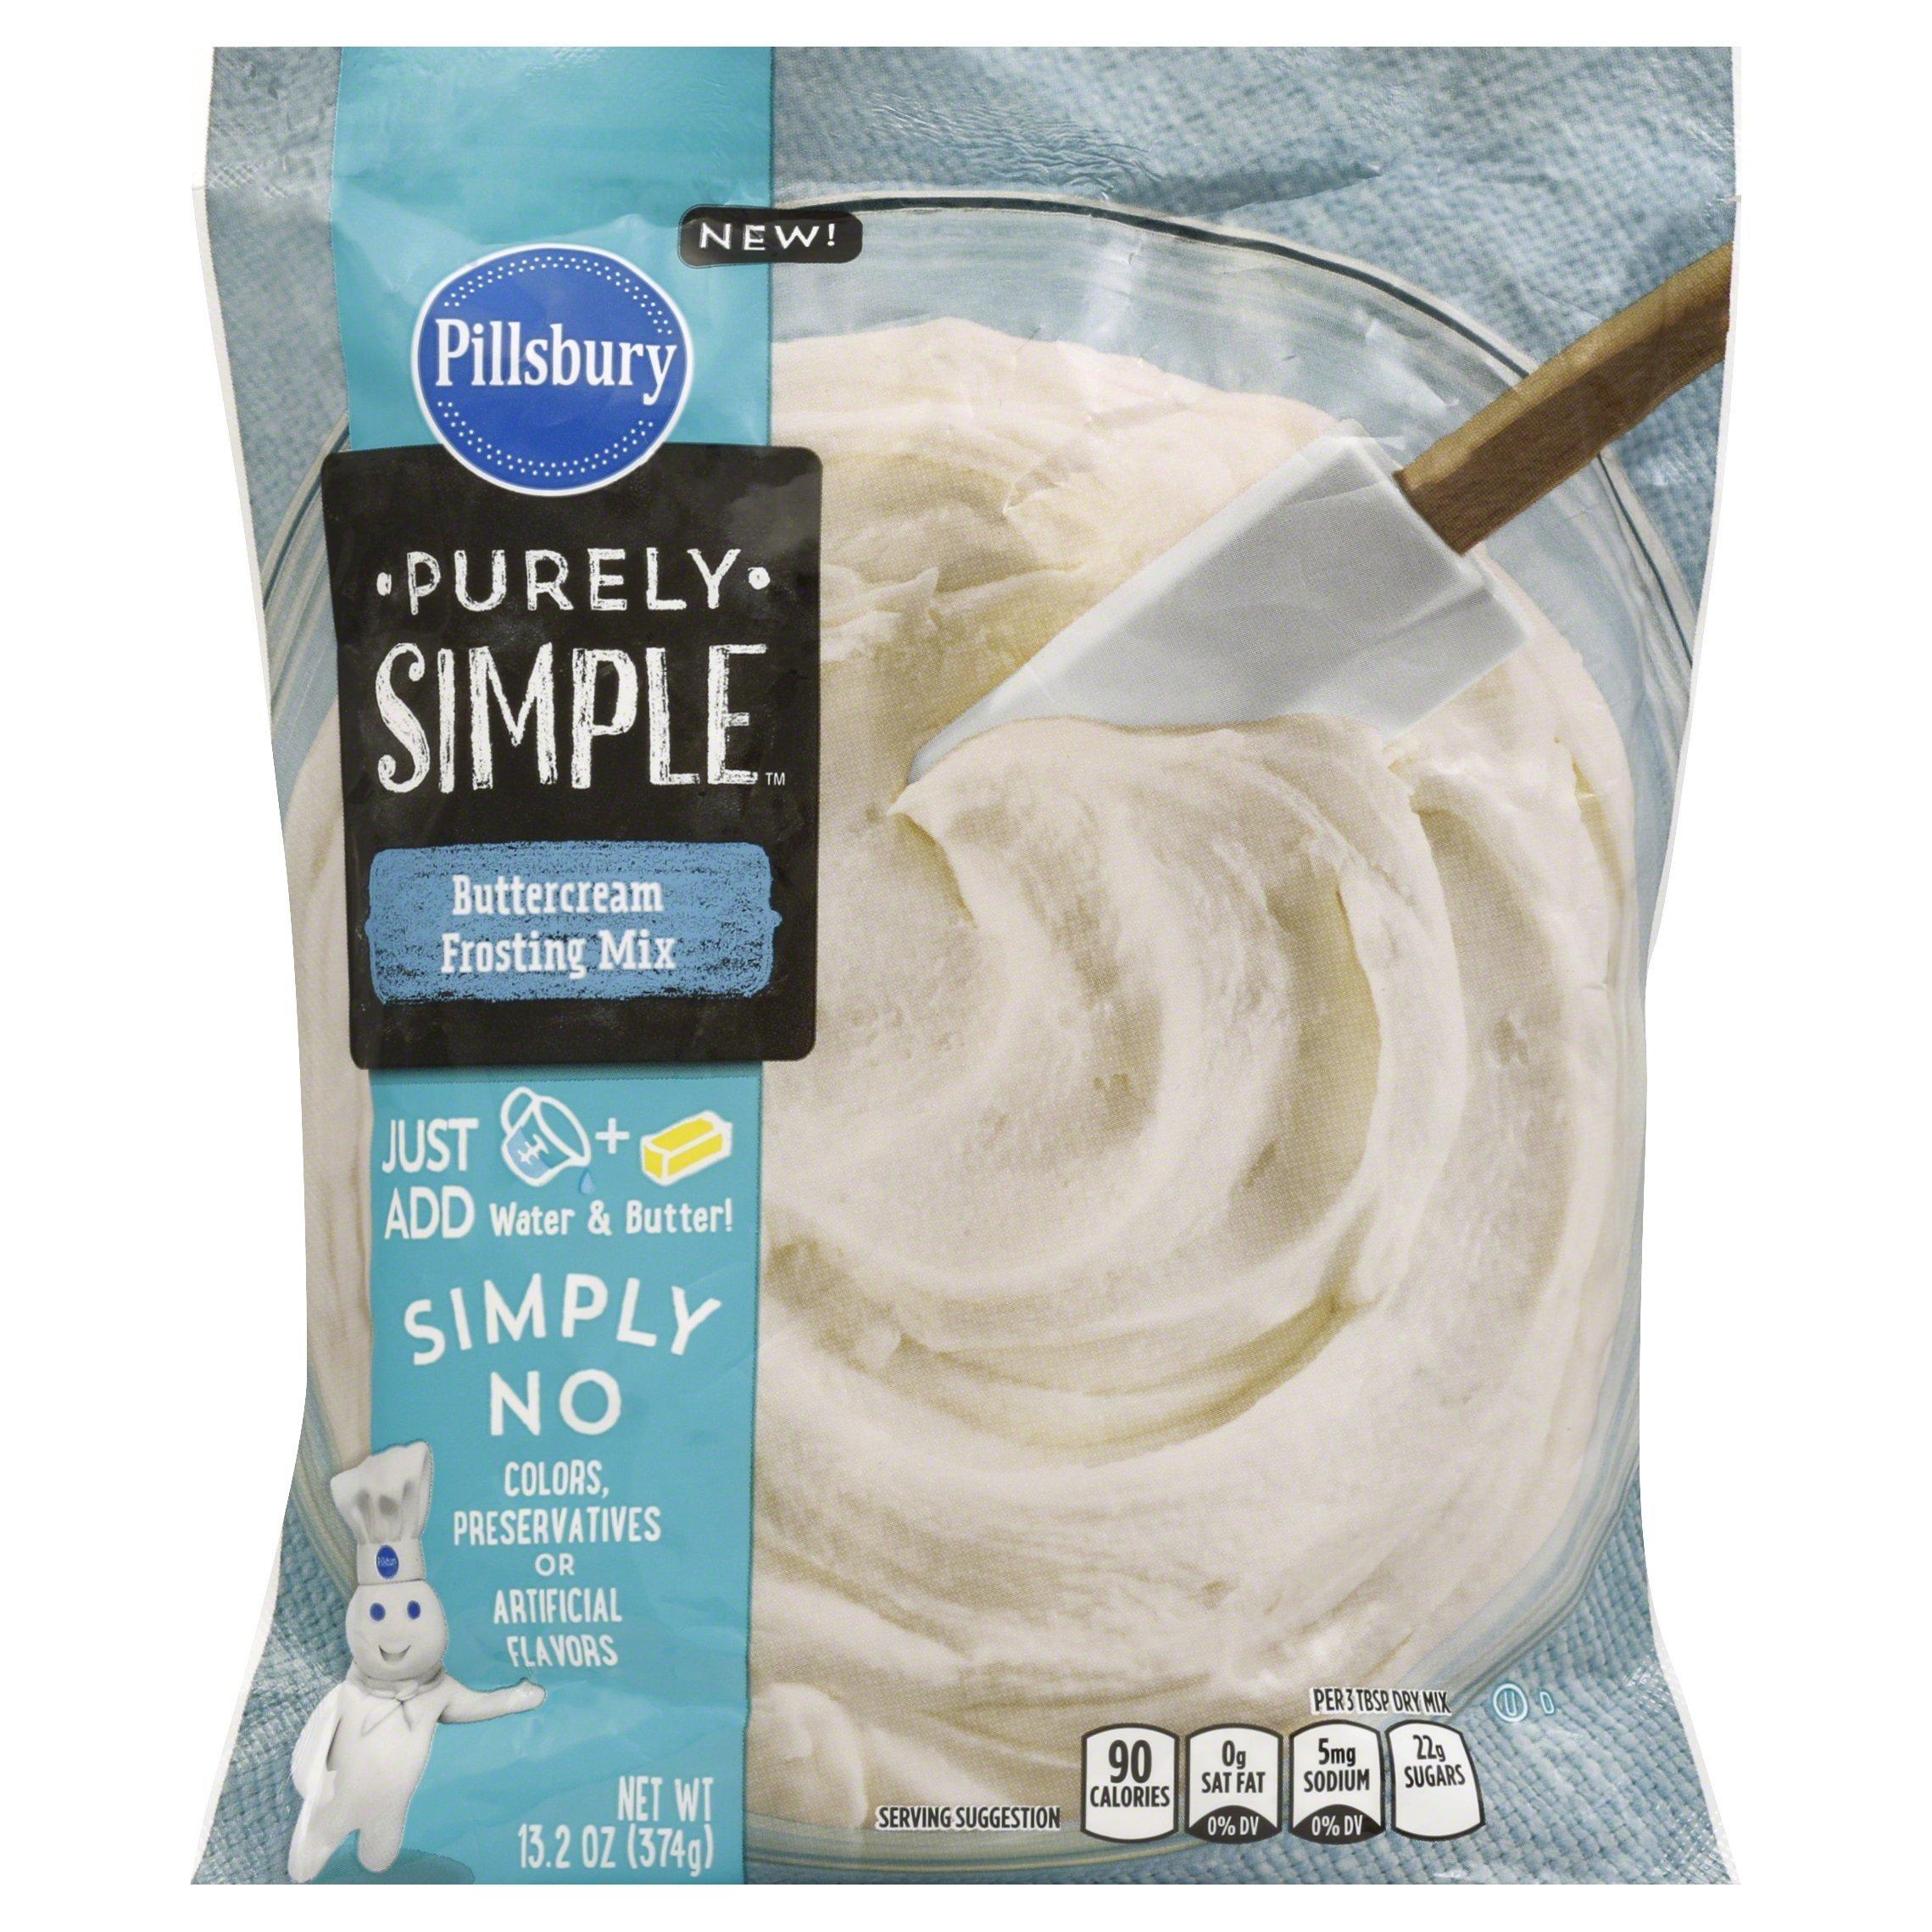 Pillsbury Purely Simple Buttercream Frosting Mix, 13.2 oz by Pillsbury (Image #1)